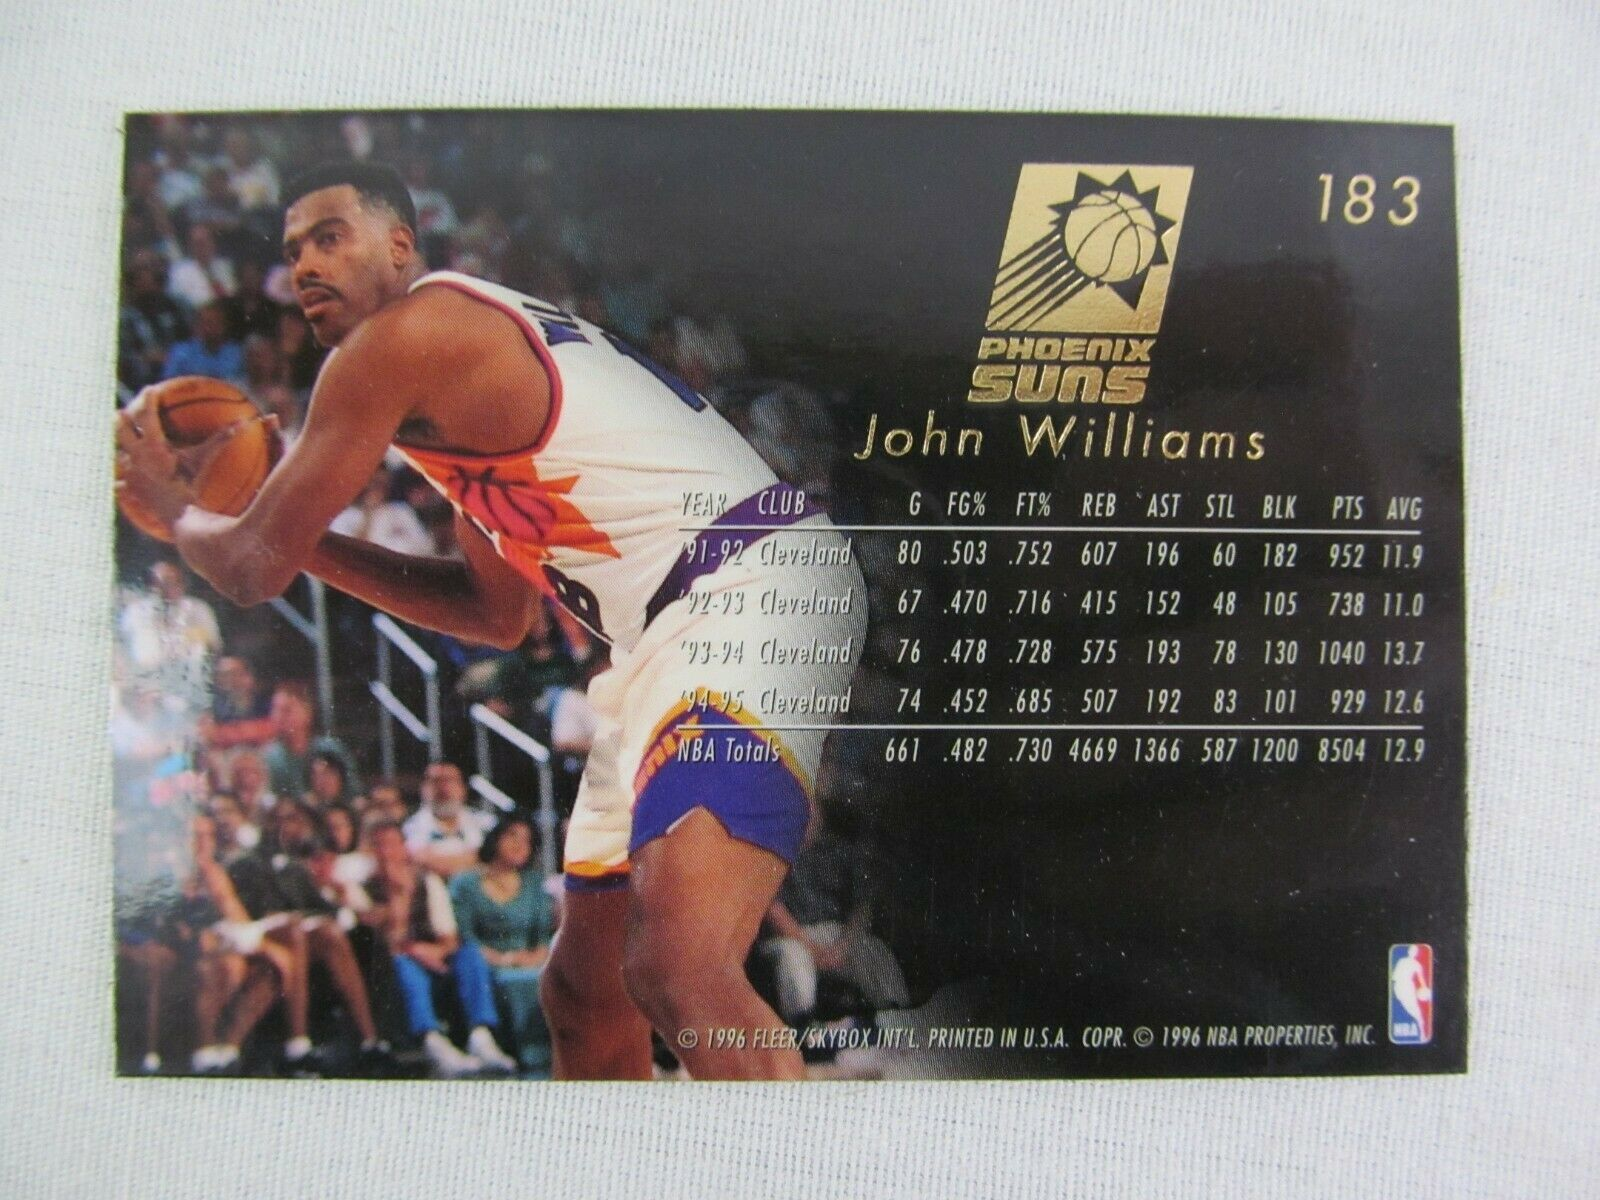 John Williams Phoenix Suns 1996 Fleer Basketball Card Number 183